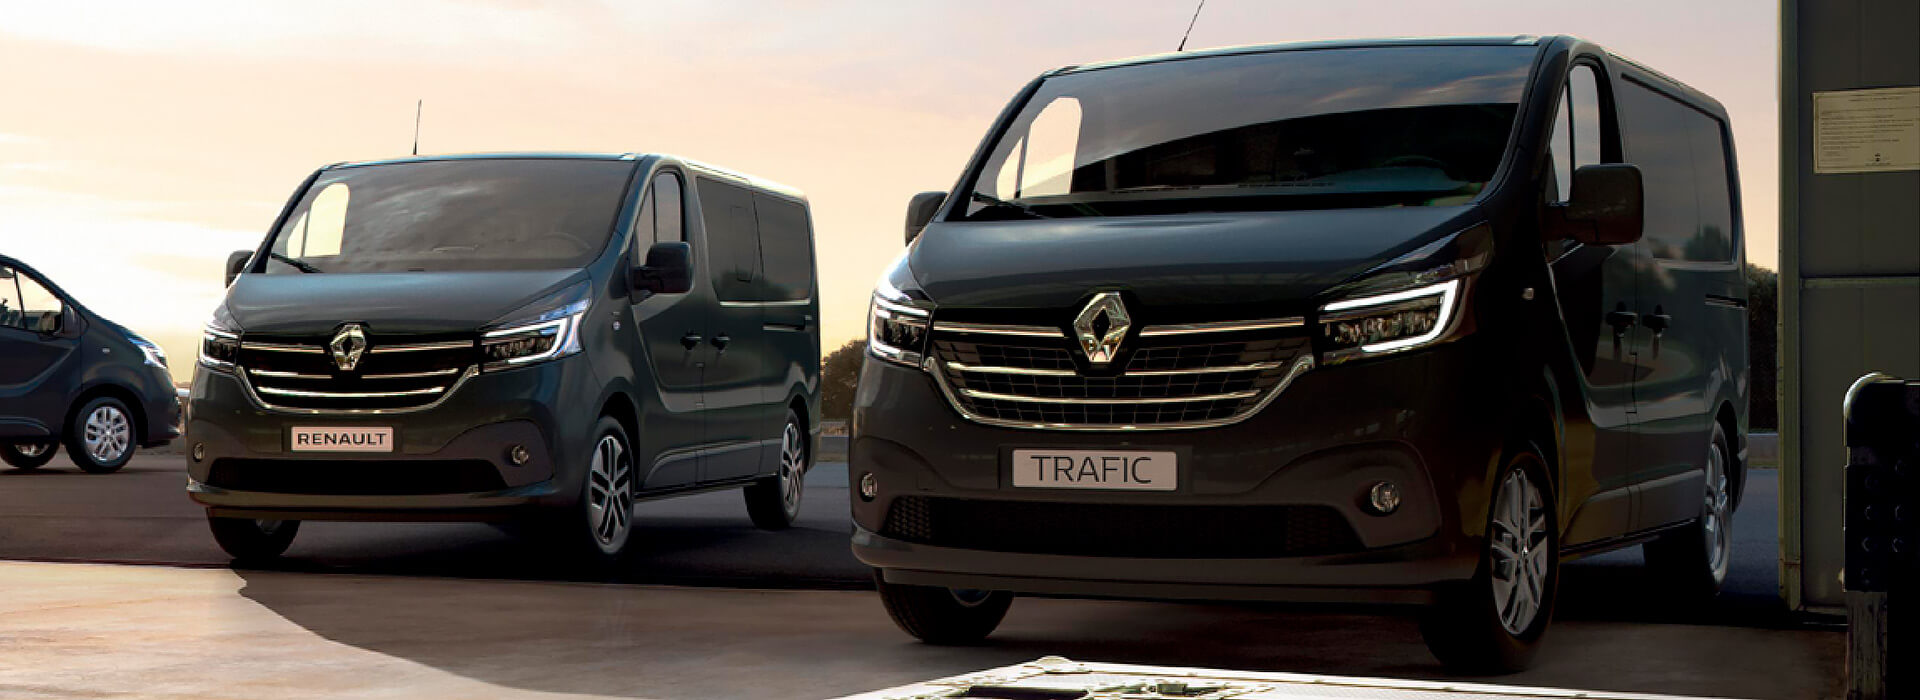 Cricks Maroochydore Renault Finance